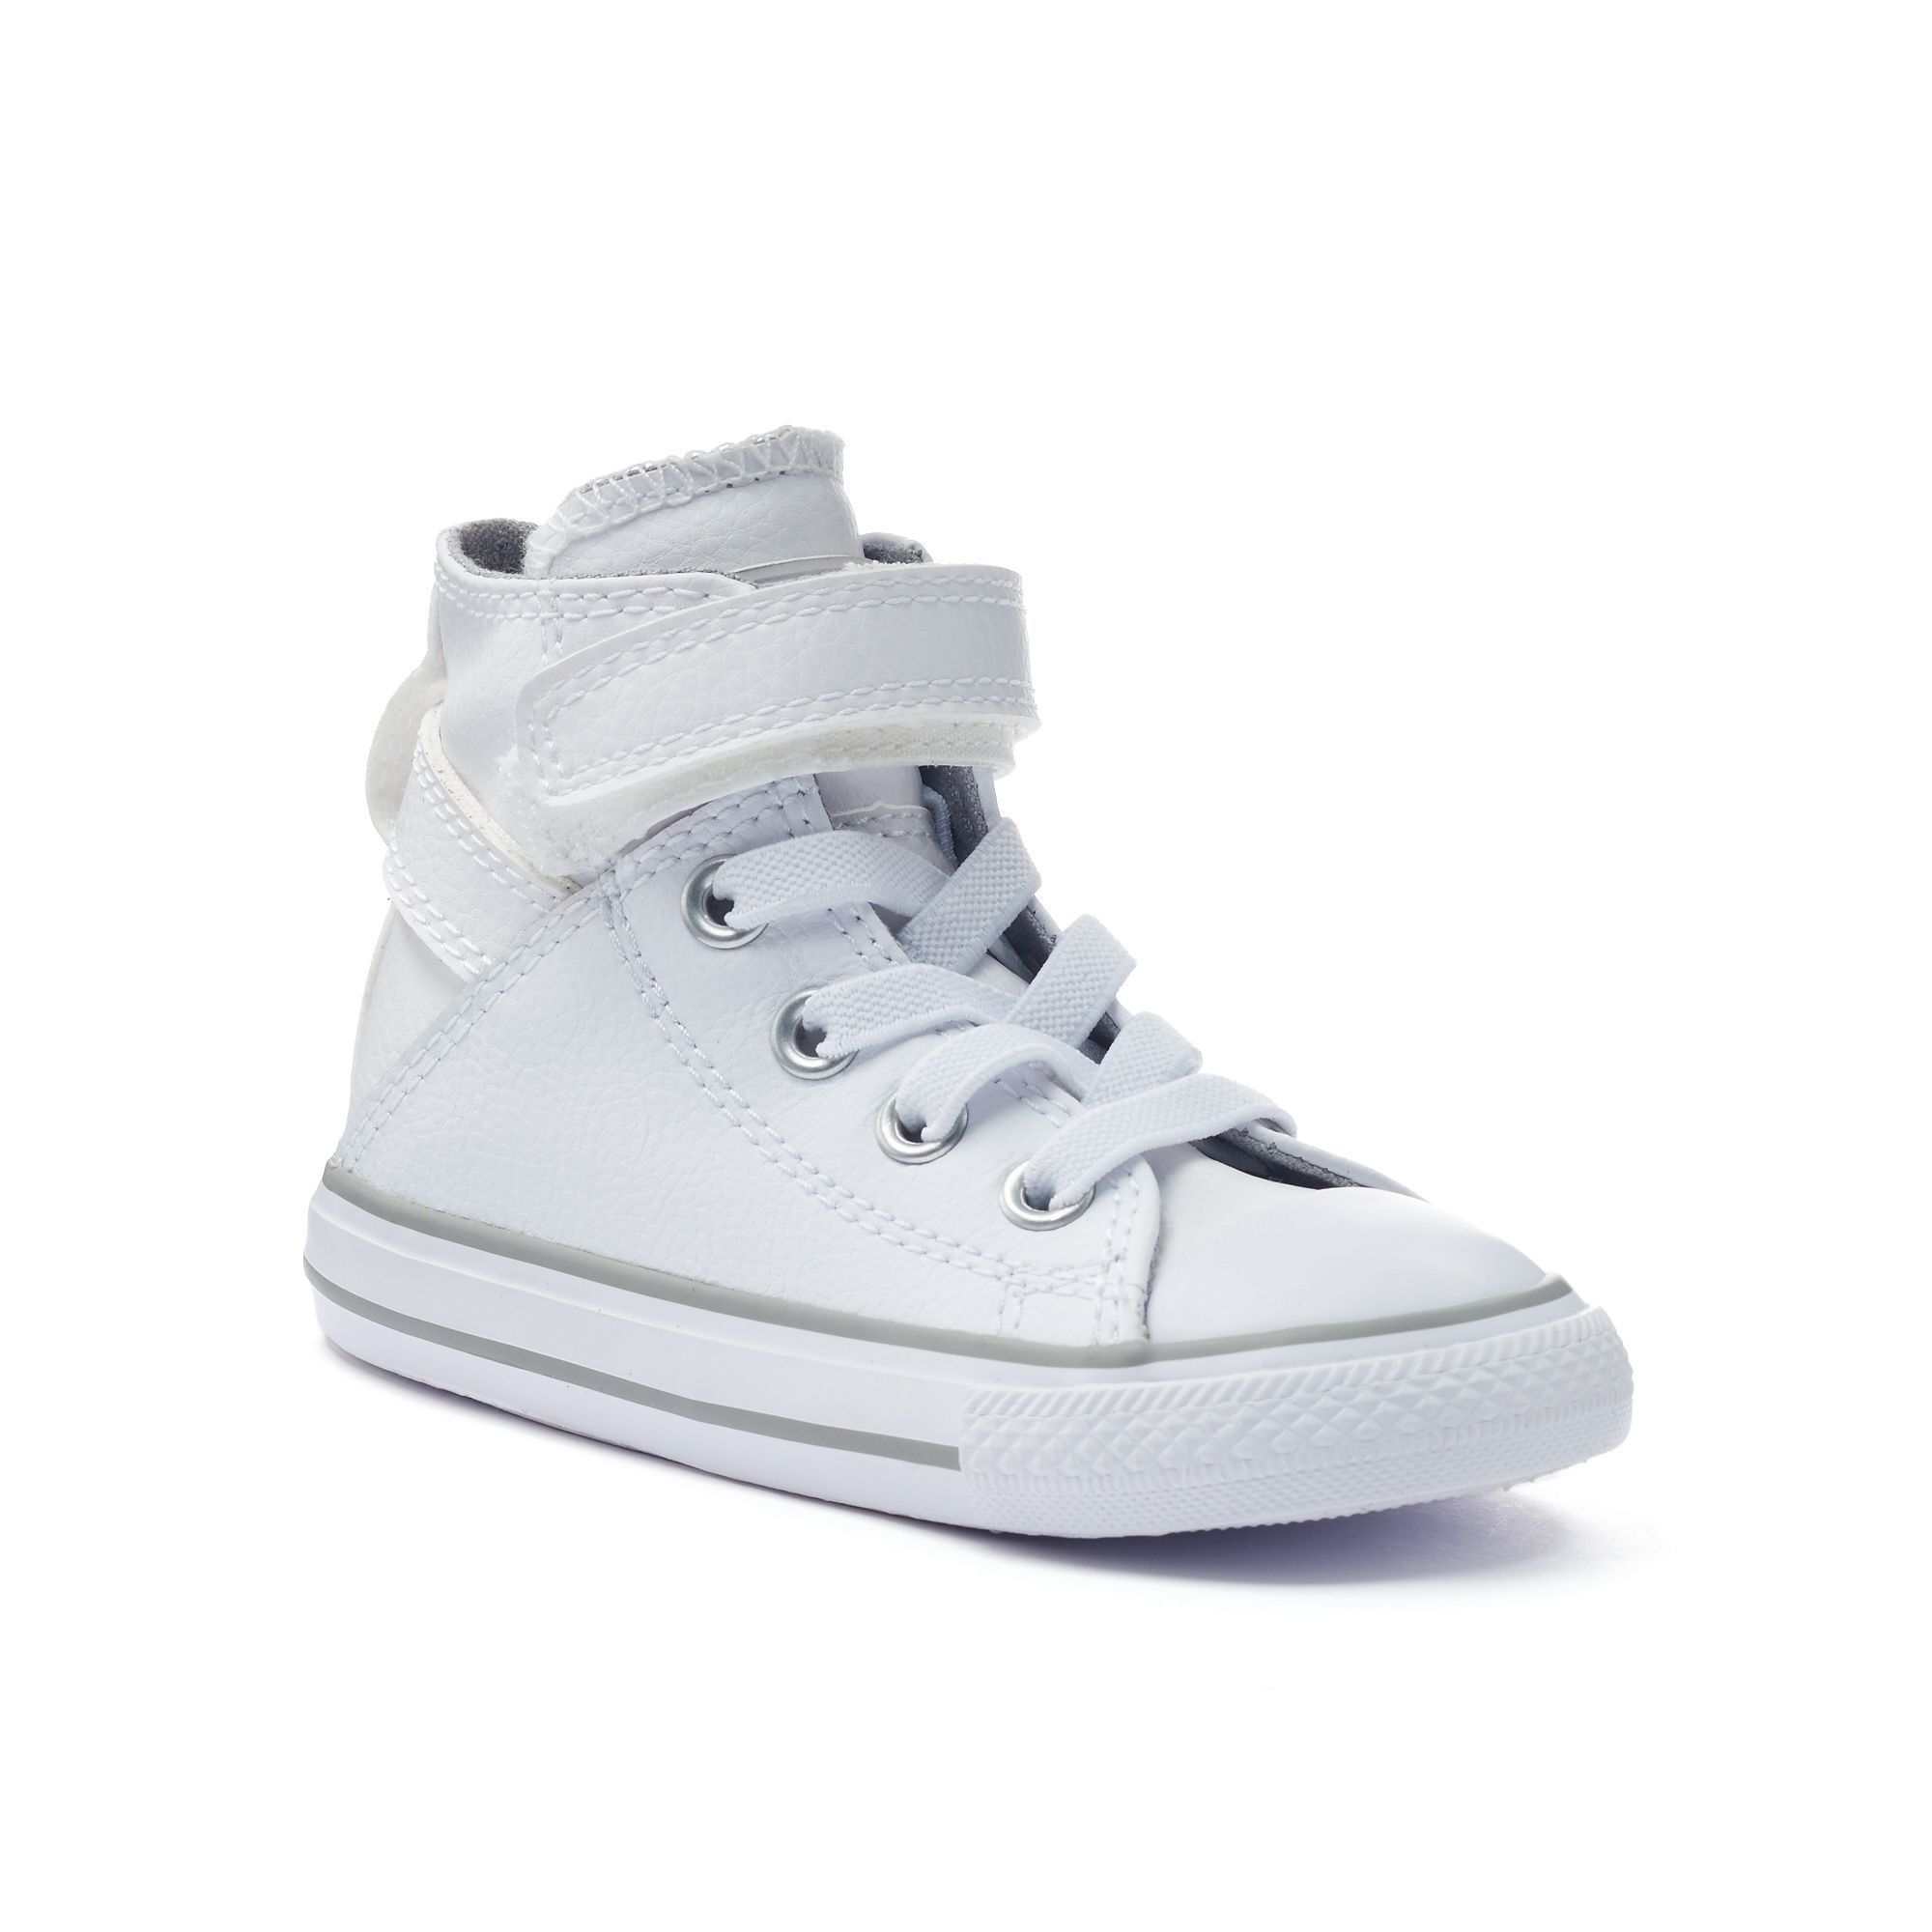 converse chuck taylor toddler size 7